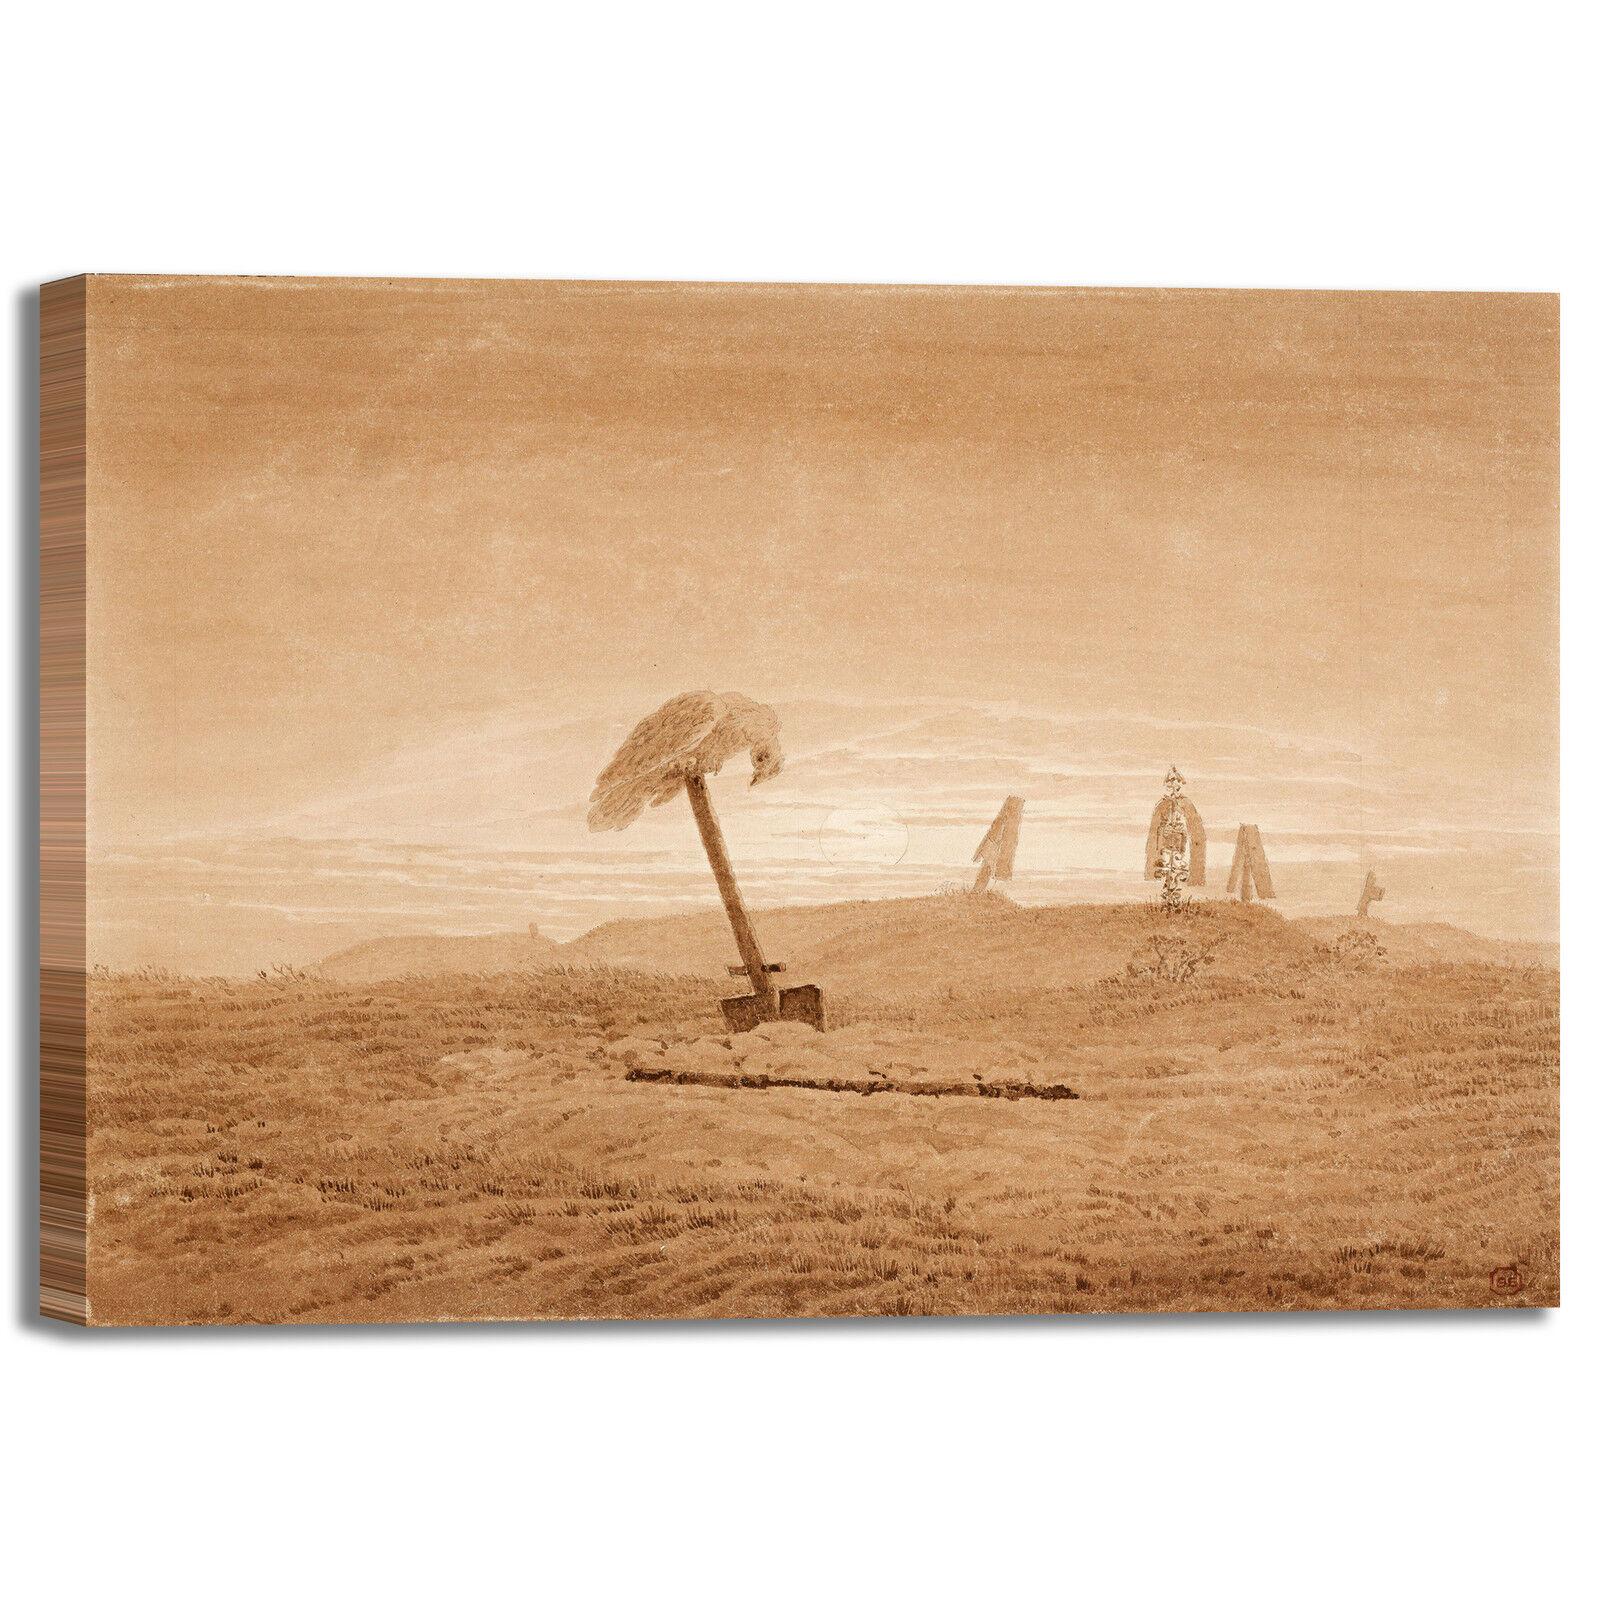 Caspar paesaggio tela design quadro stampa tela paesaggio dipinto telaio arRouge o casa 6a8013